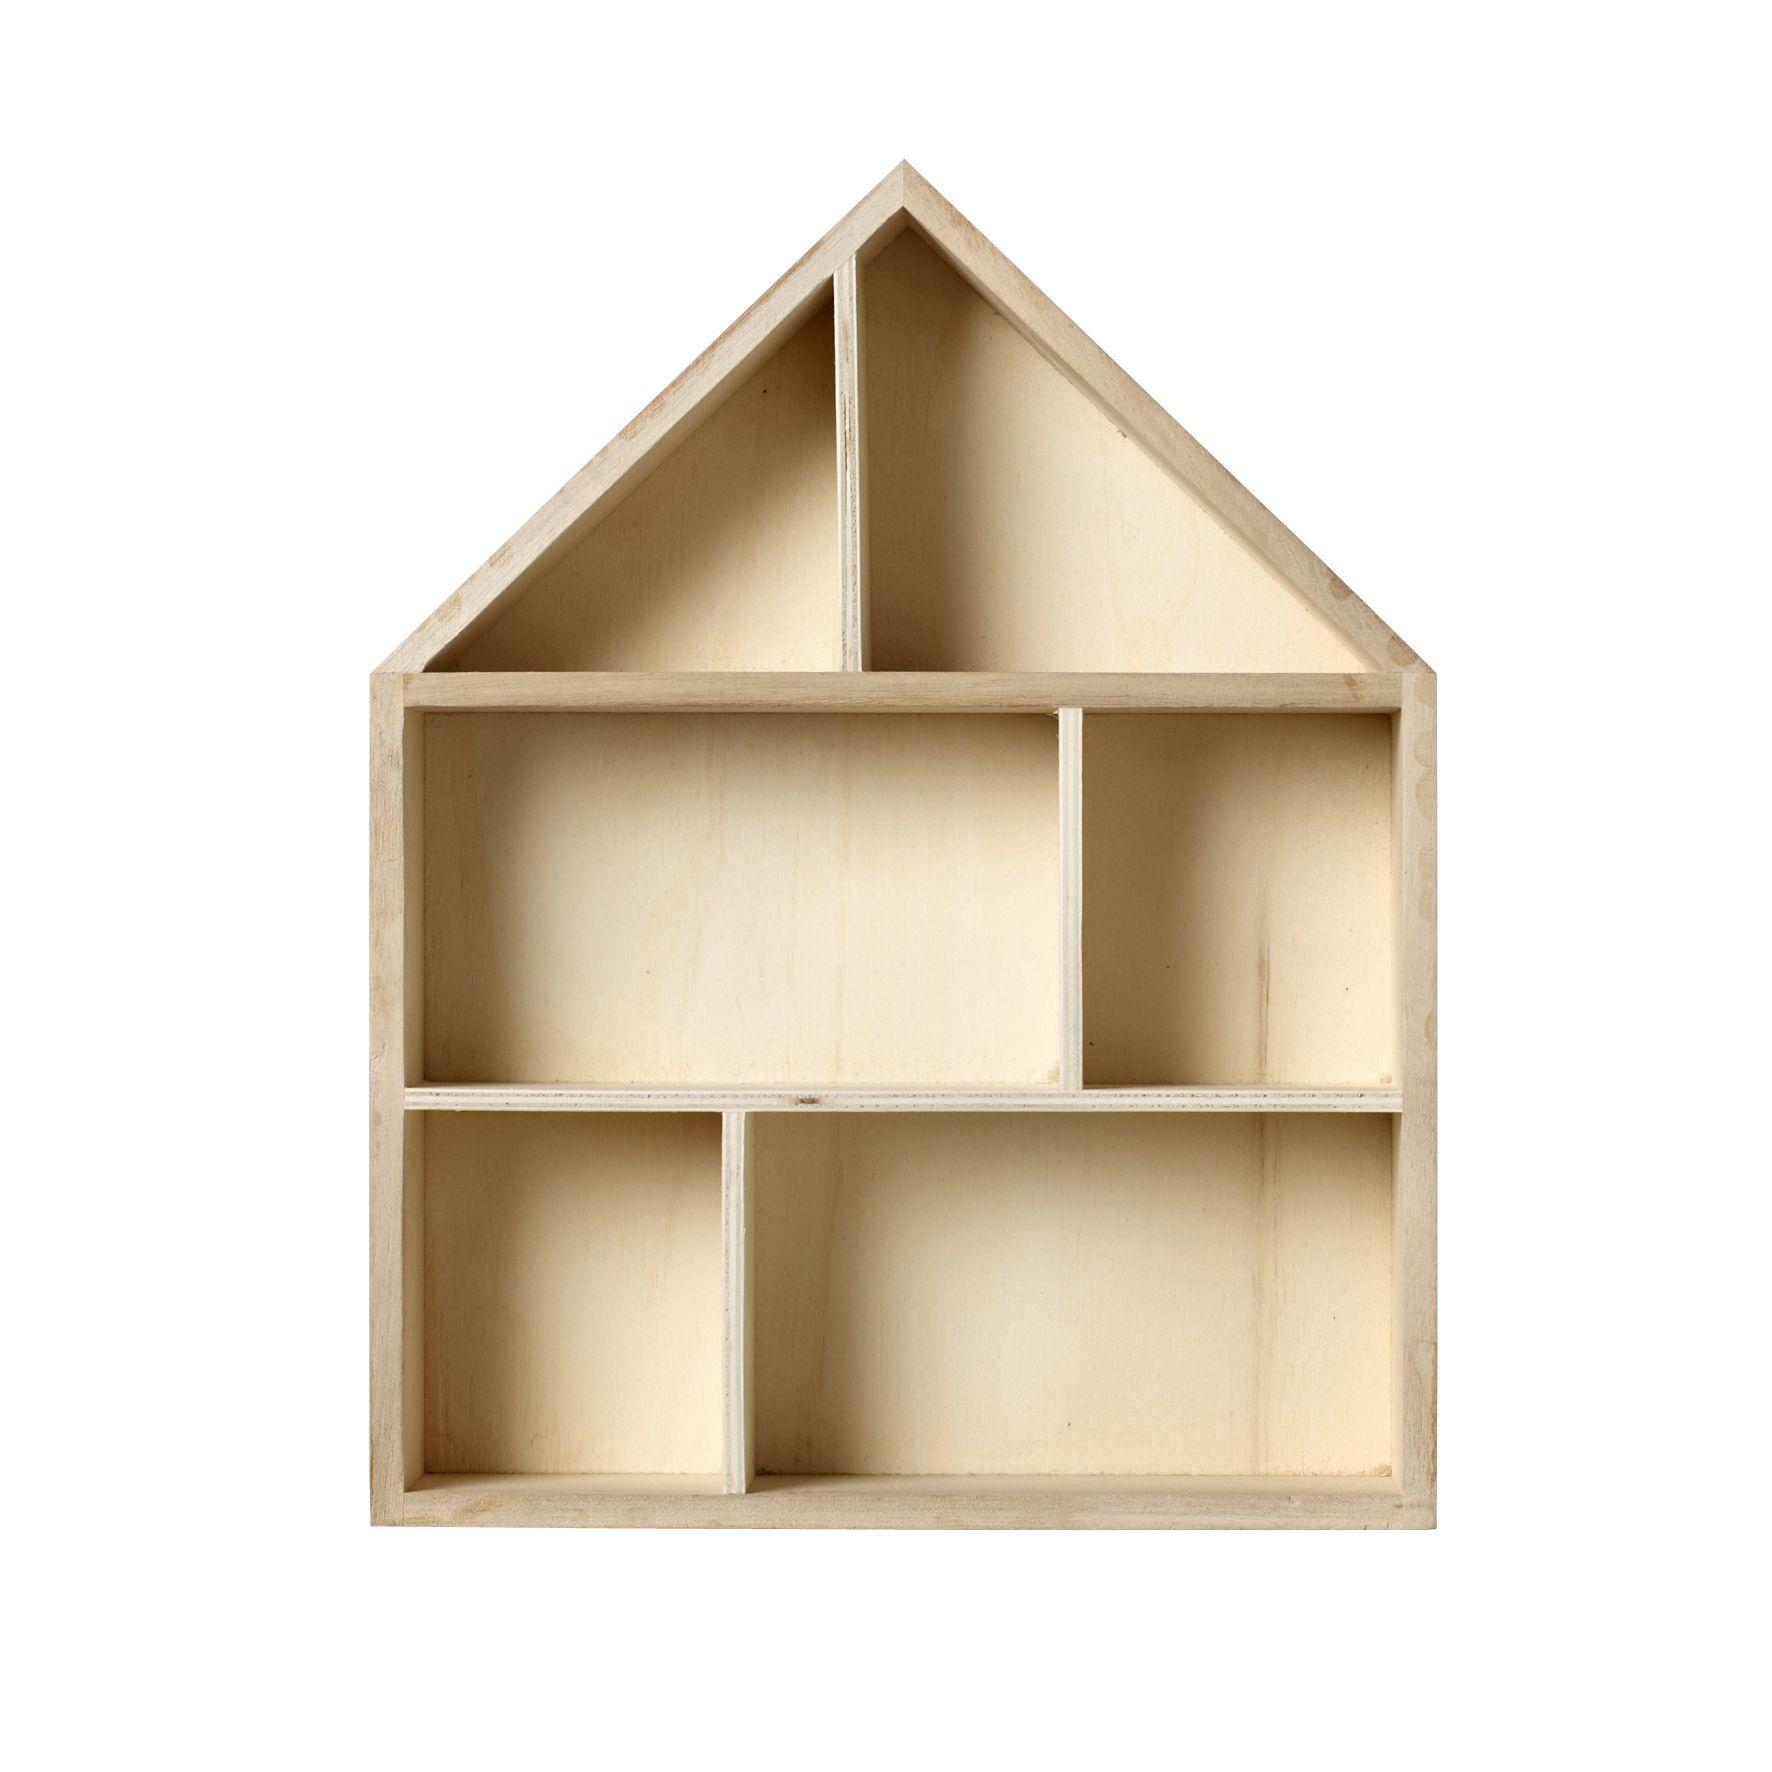 House Shaped Shadow Box Wooden Display Box Box Houses Decor